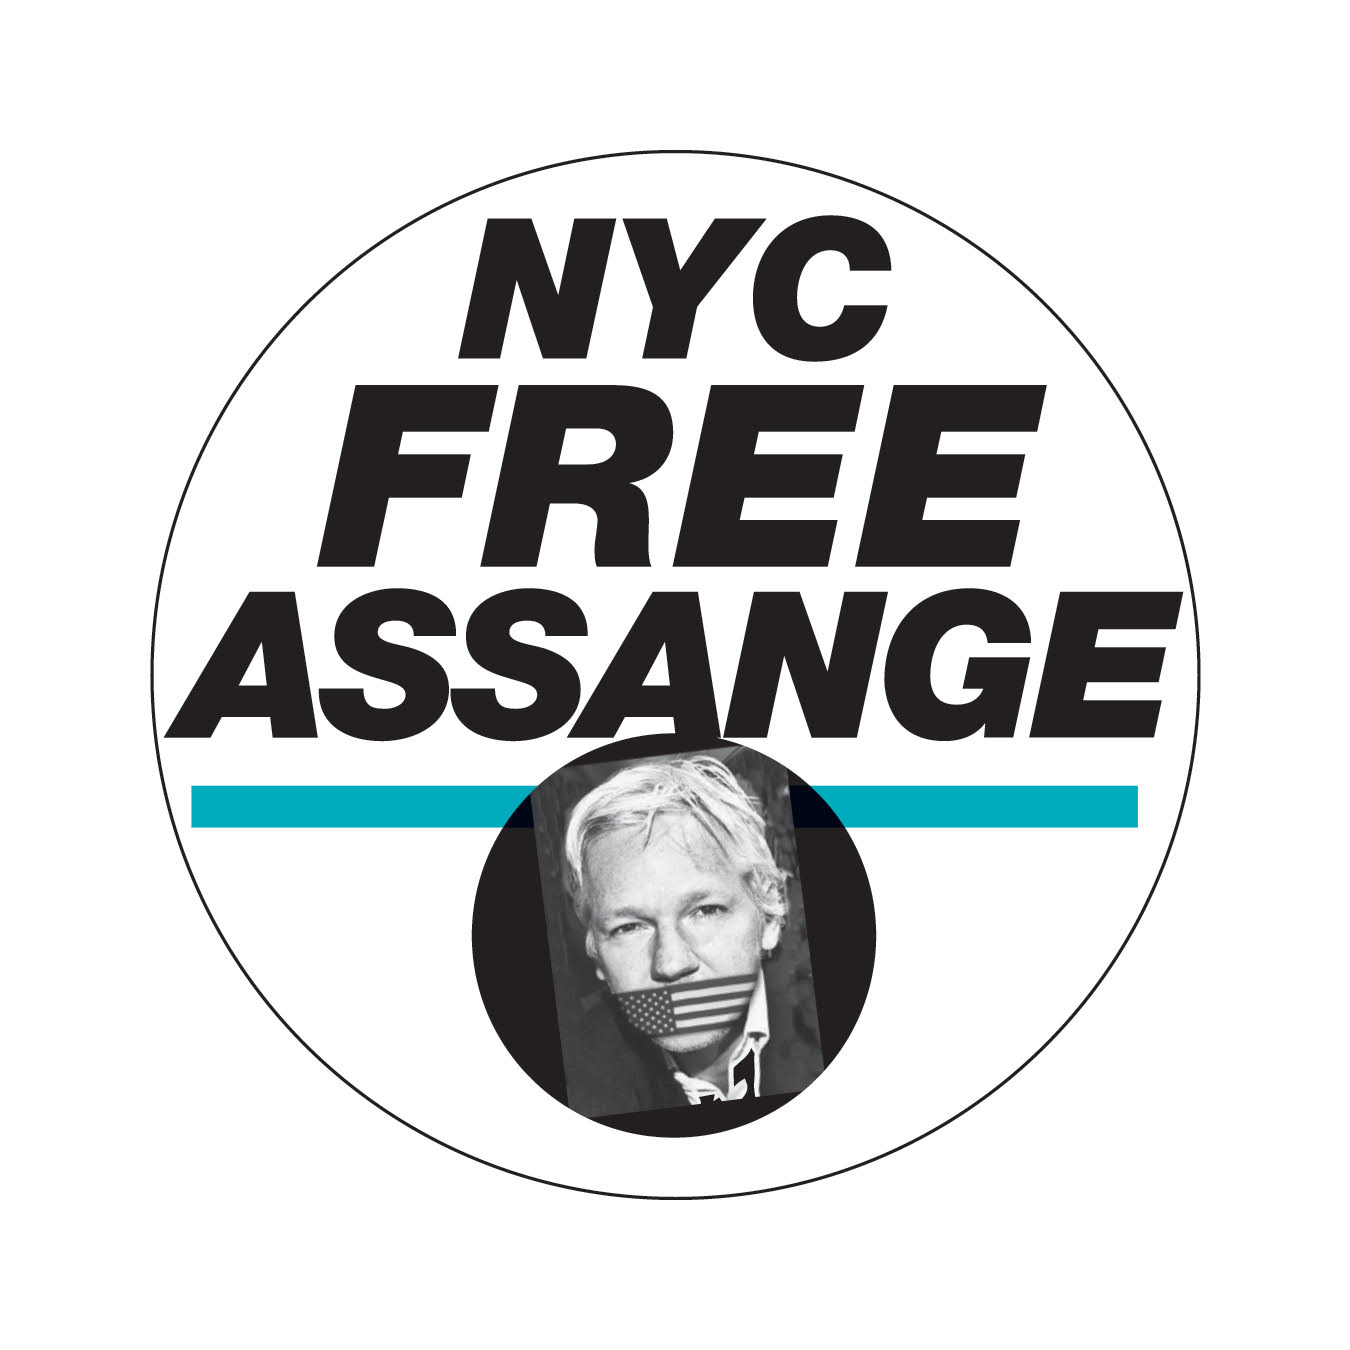 NYC Free Assange